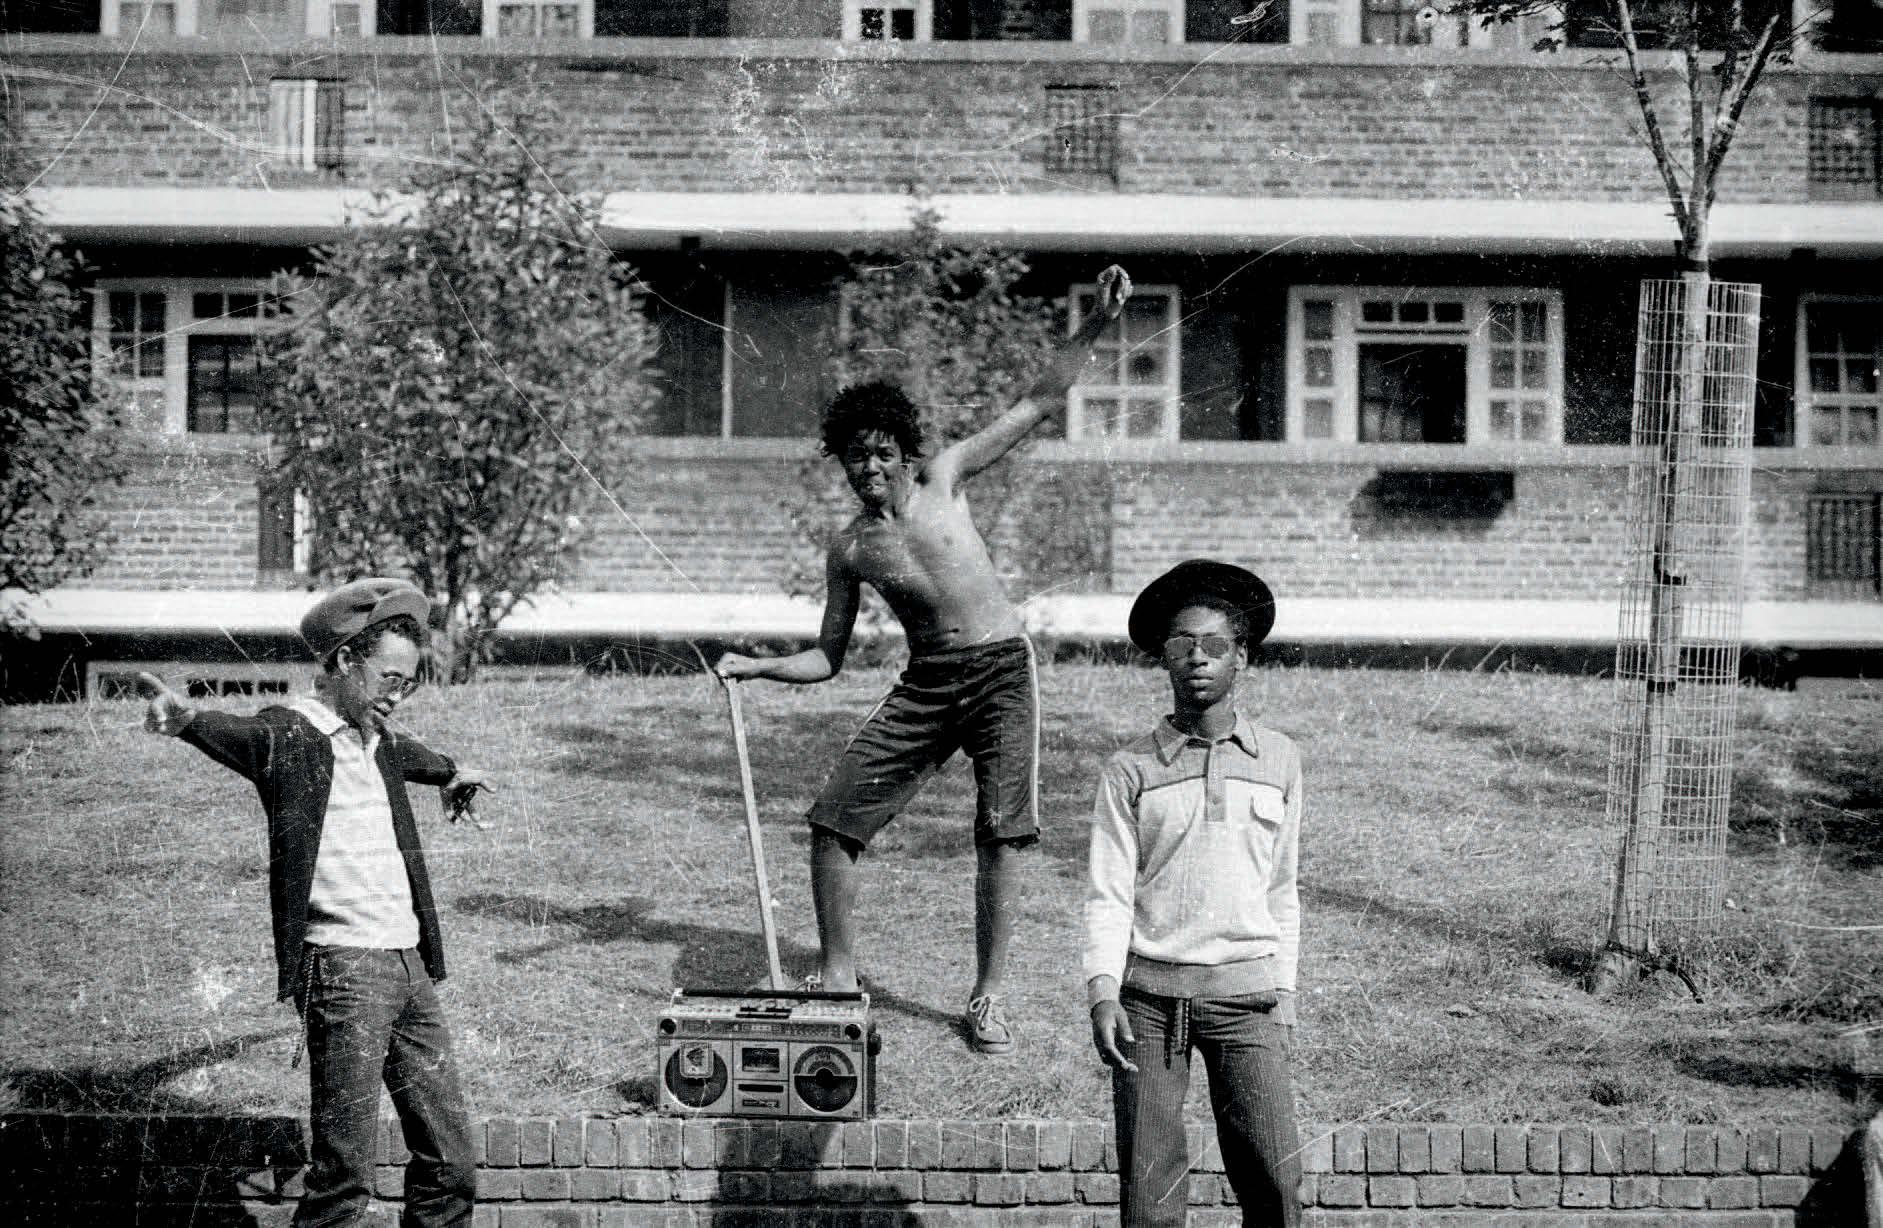 rastas-peckham-london-1978.jpg